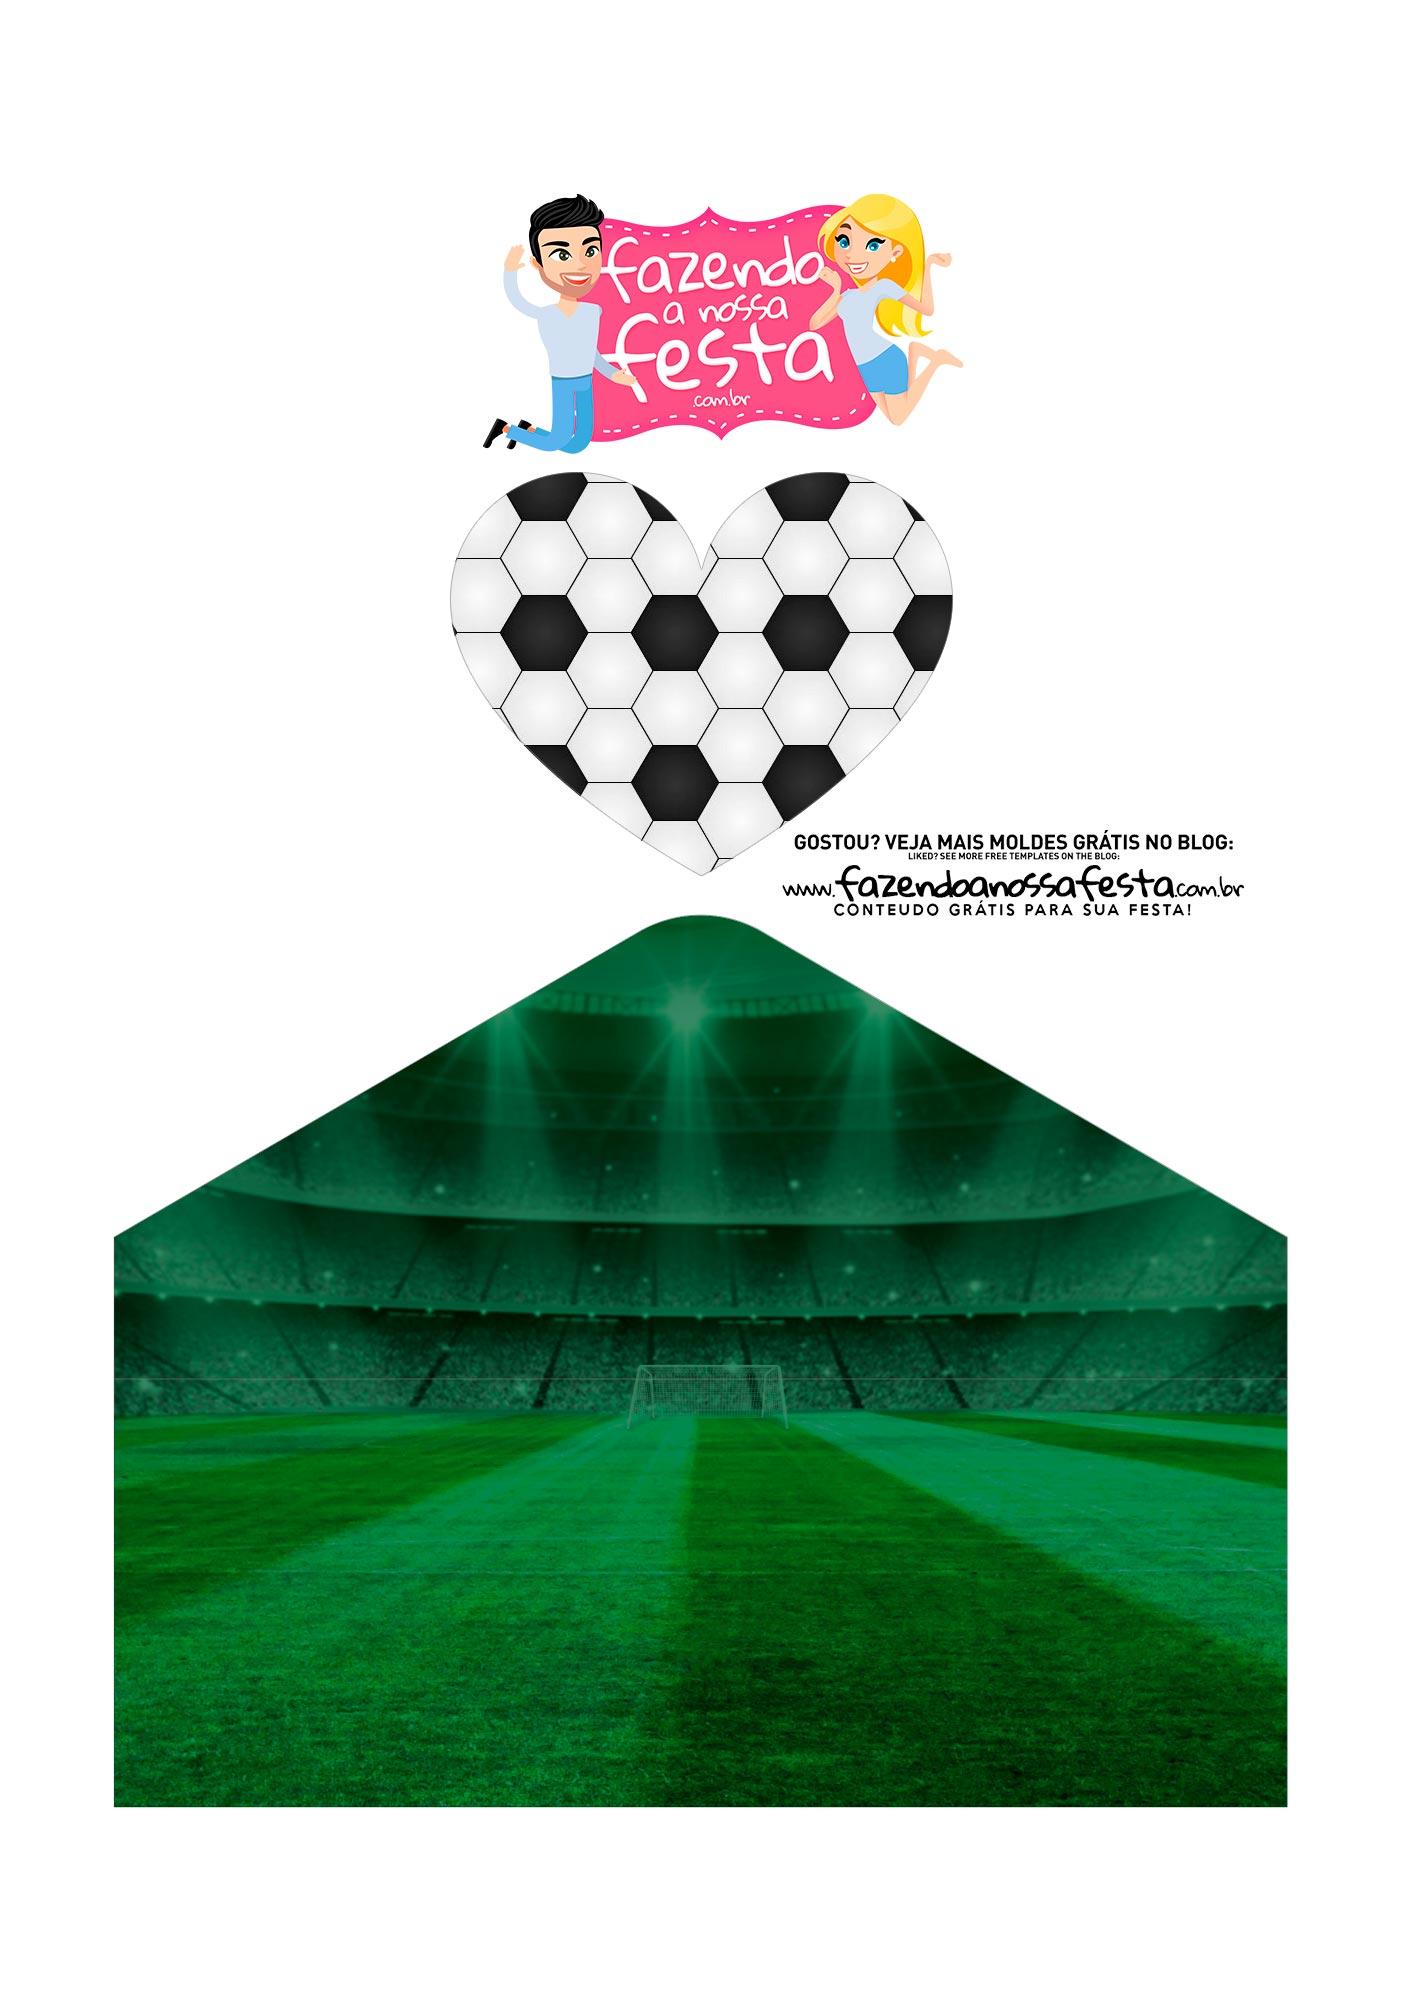 Caixa Envelope Pai Palmeiras 3